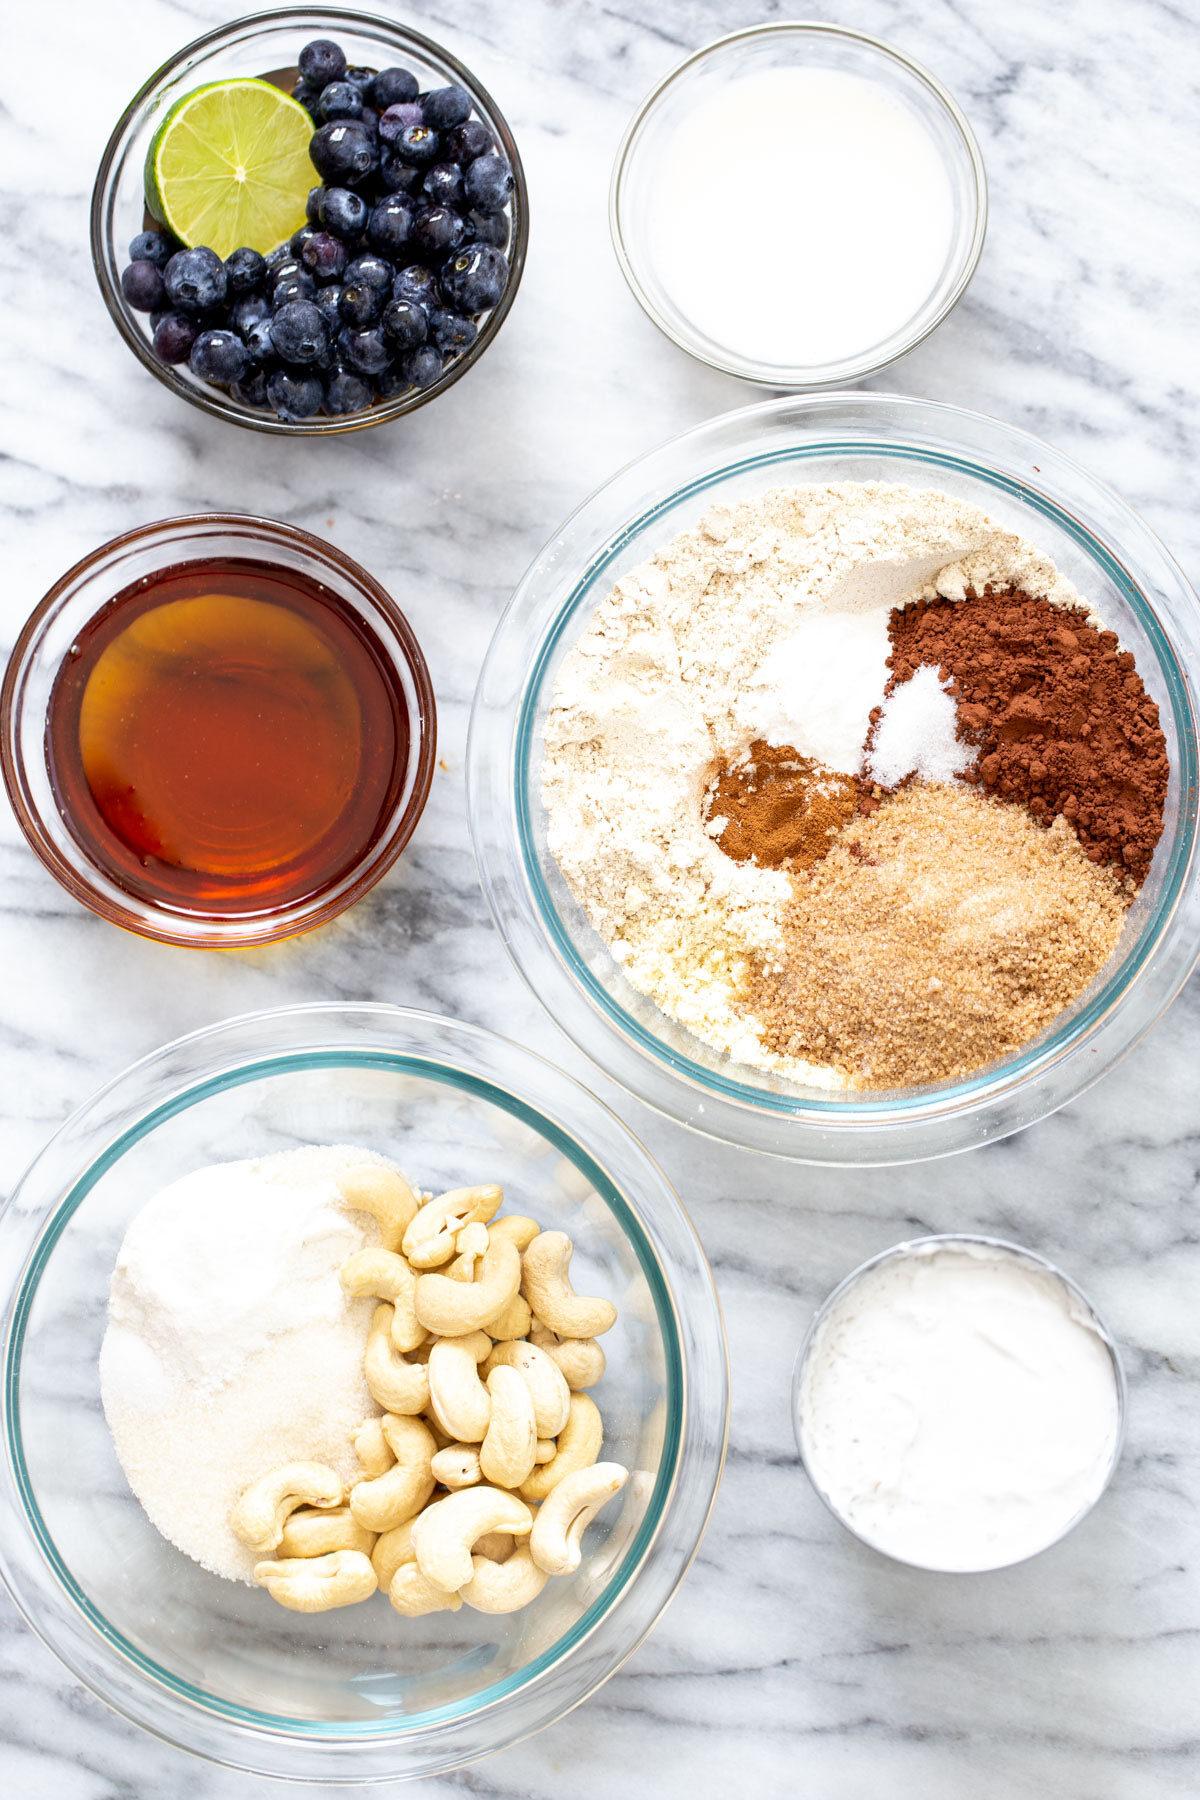 ingredients needed for making vegan vanilla ice cream sandwiches